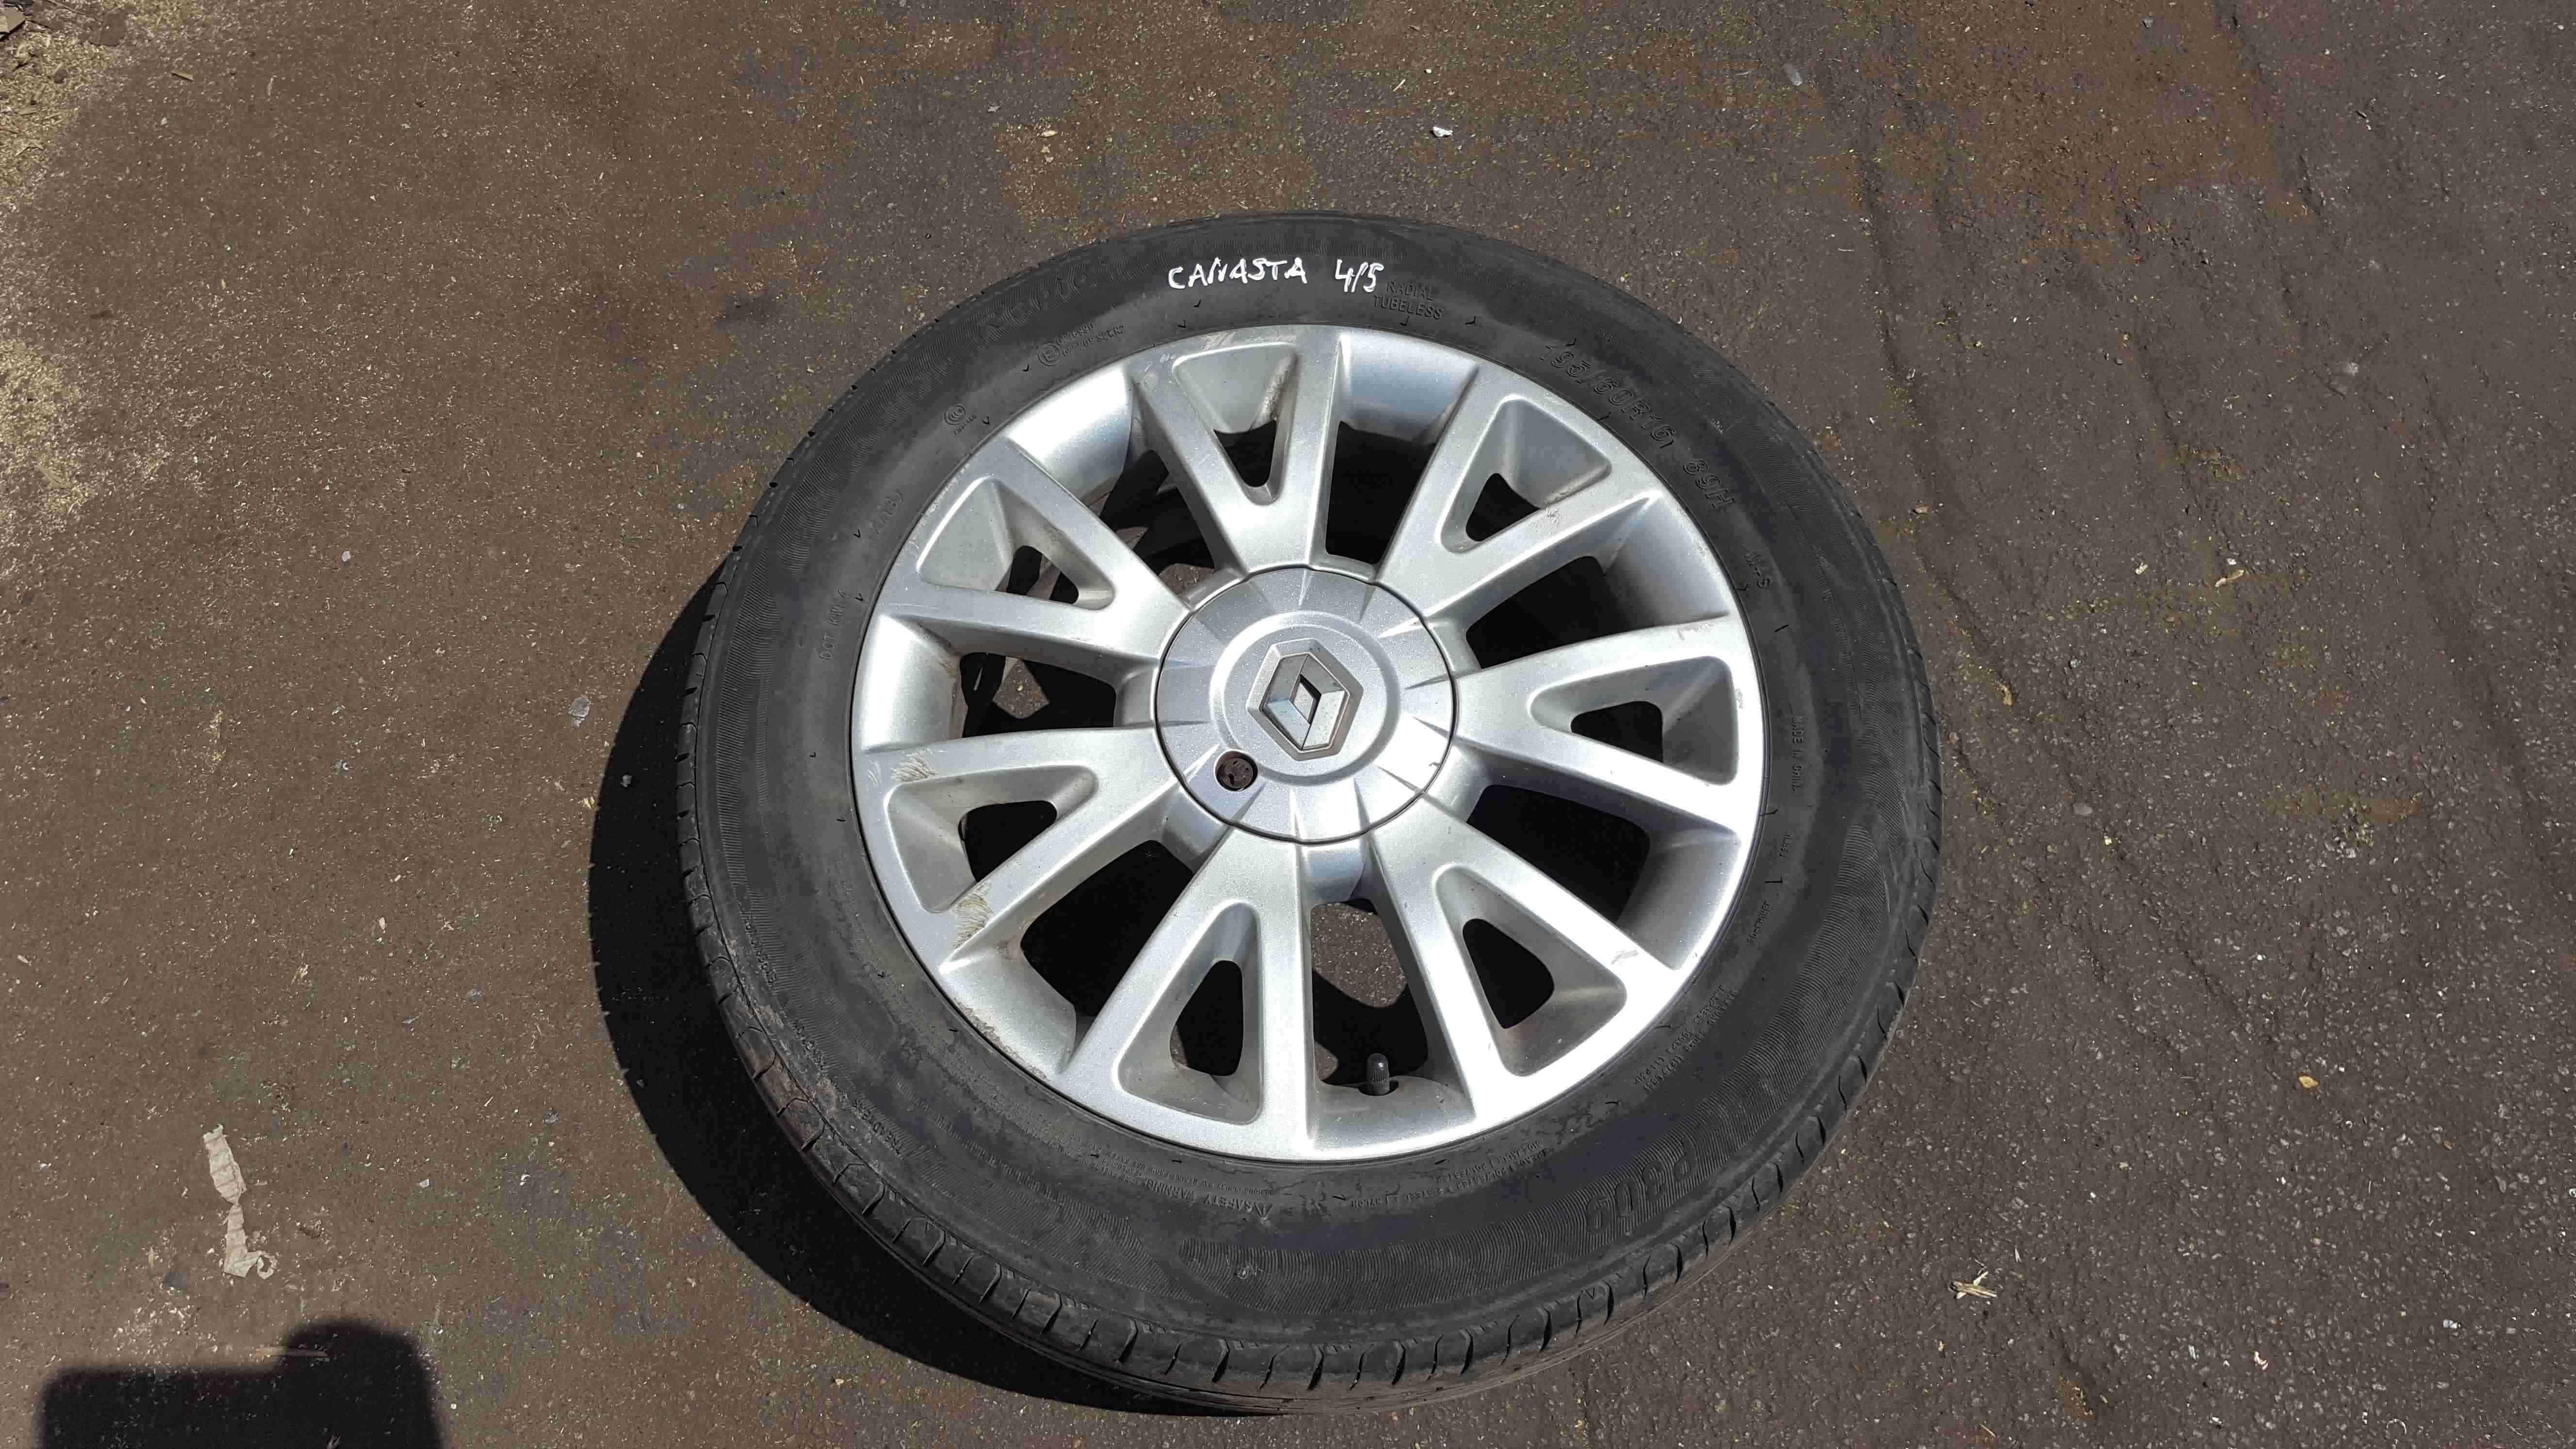 Renault Clio MK3 2005-2012 Canasta Alloy Wheel 16inch + Tyre 195 60 16 5mm 4/5